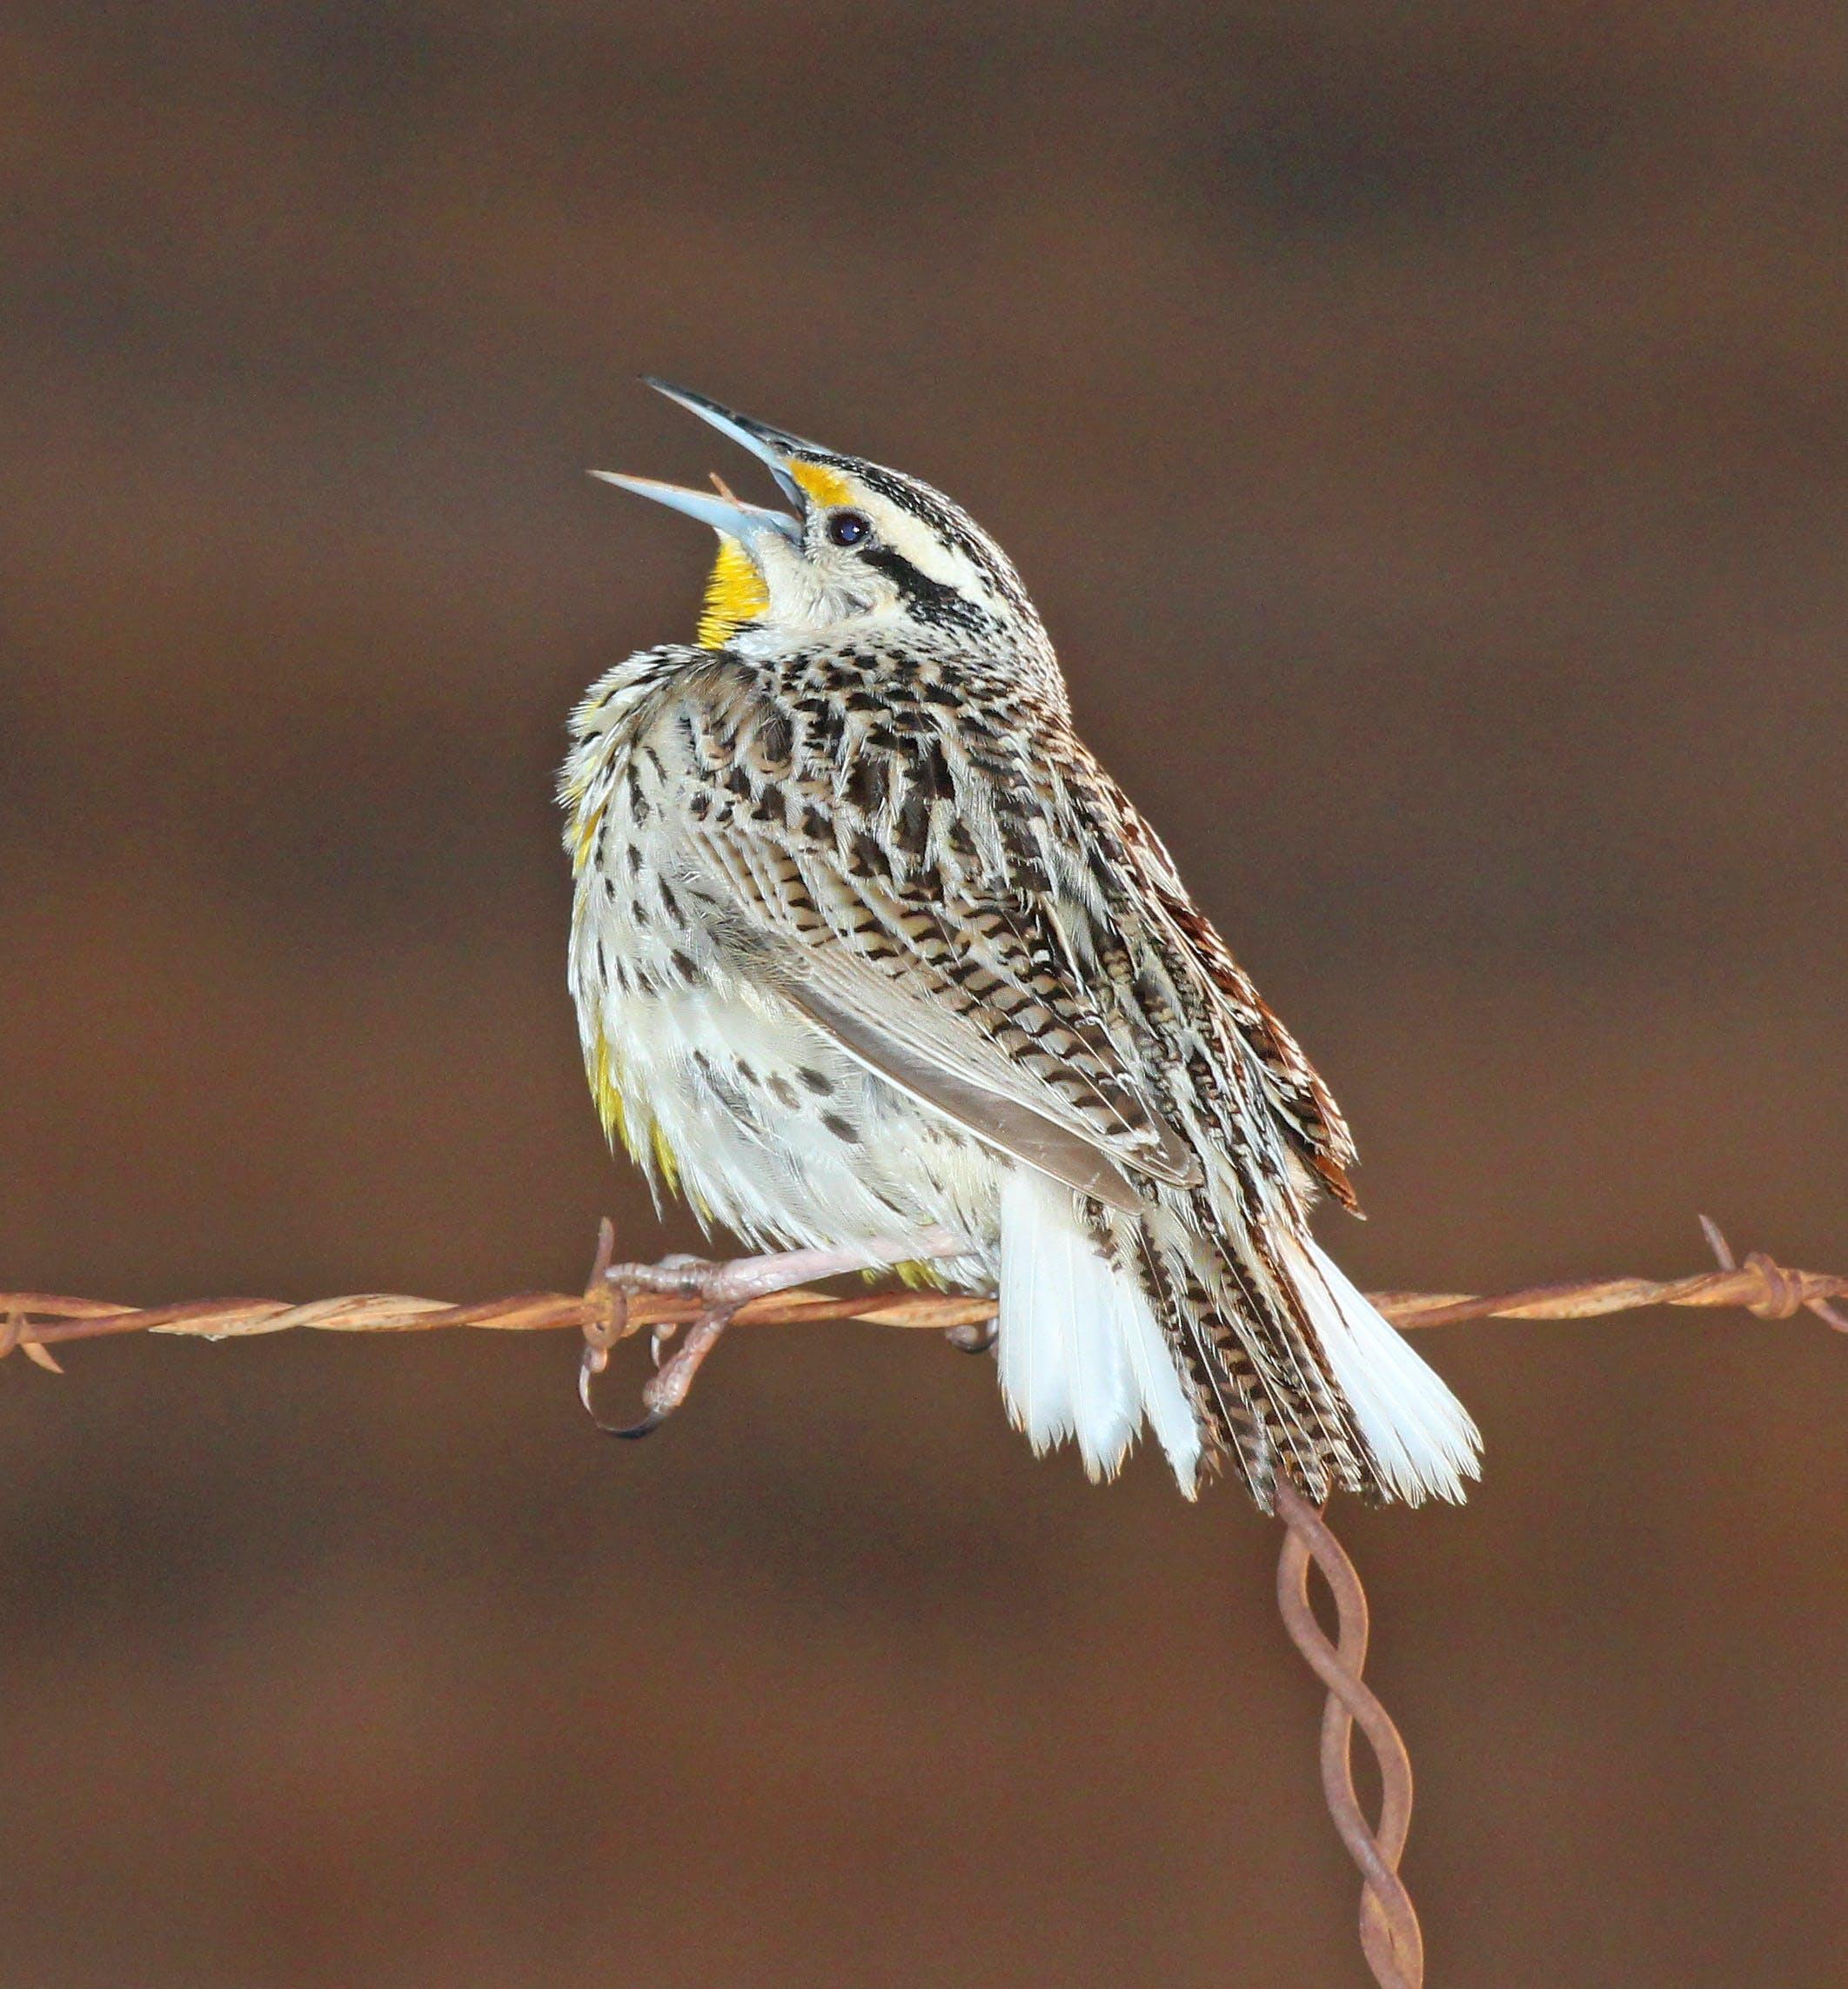 Free stock photo of bird, animal, feather, avian